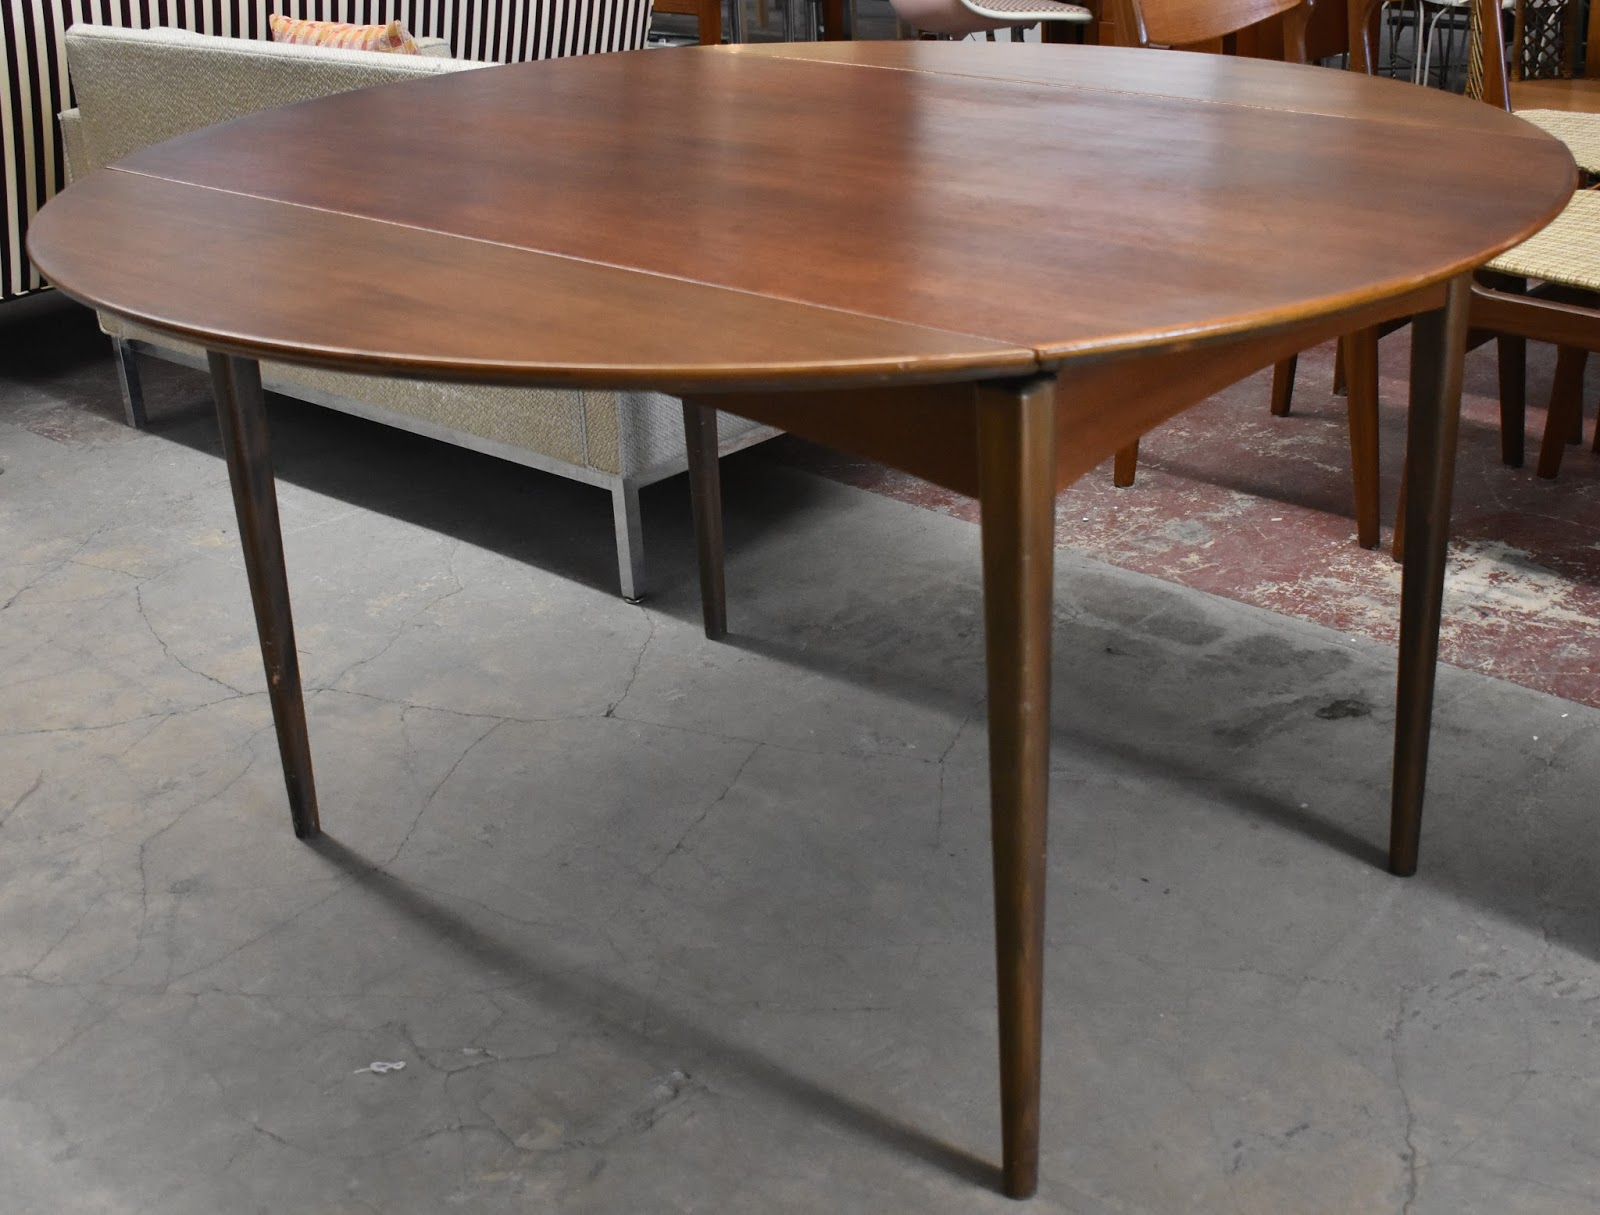 Vintage Dux Teak Dining Table Two self storing drop leaves Sweden c